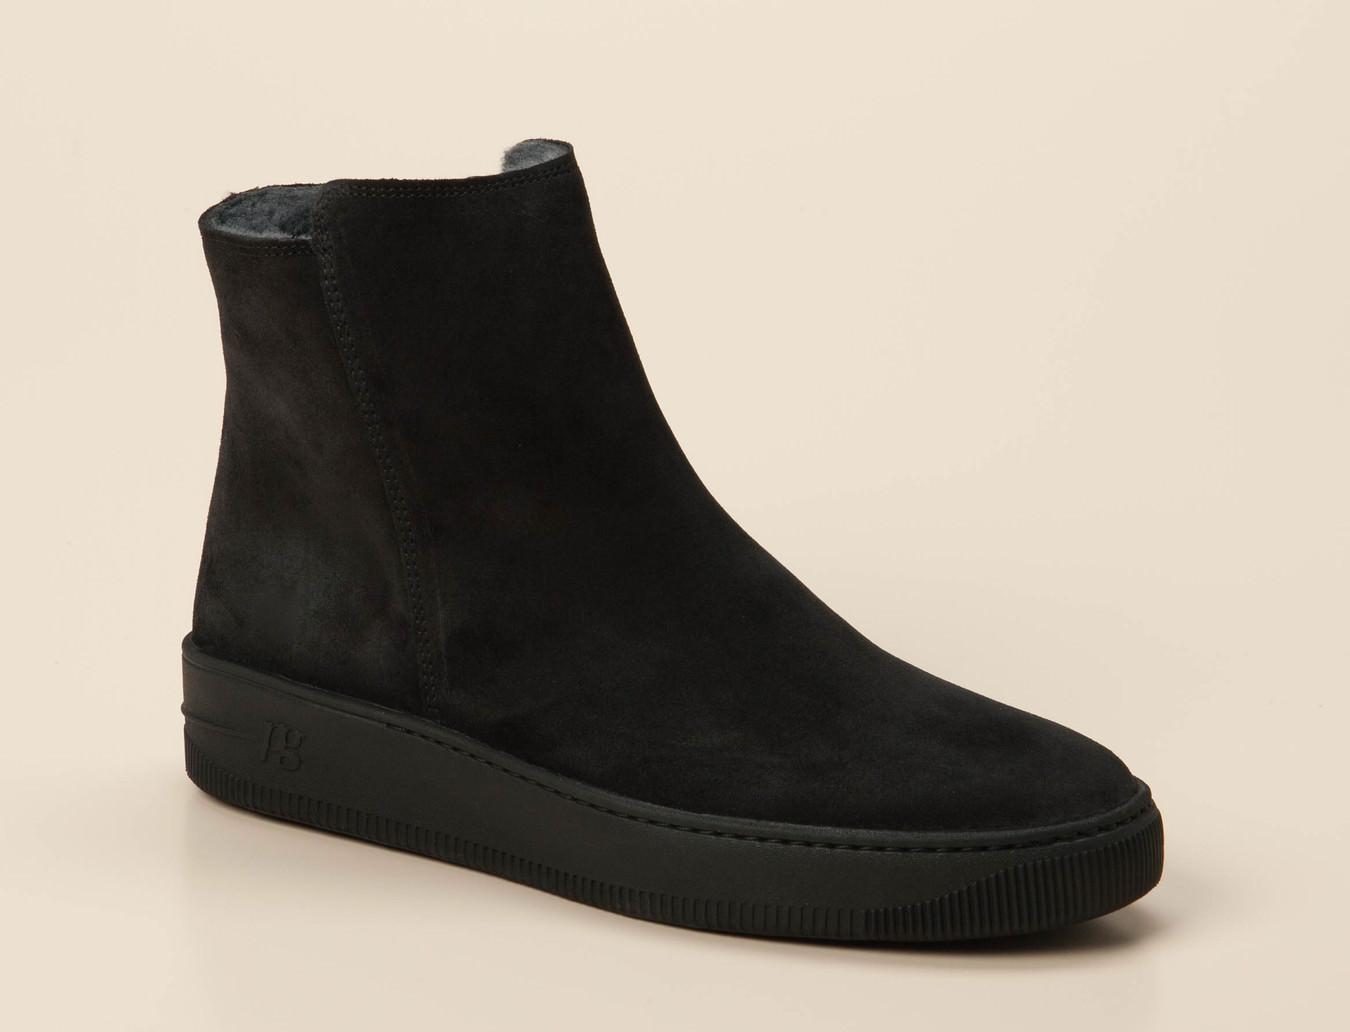 53633cd6fd8748 Paul Green Damen Stiefelette in schwarz kaufen